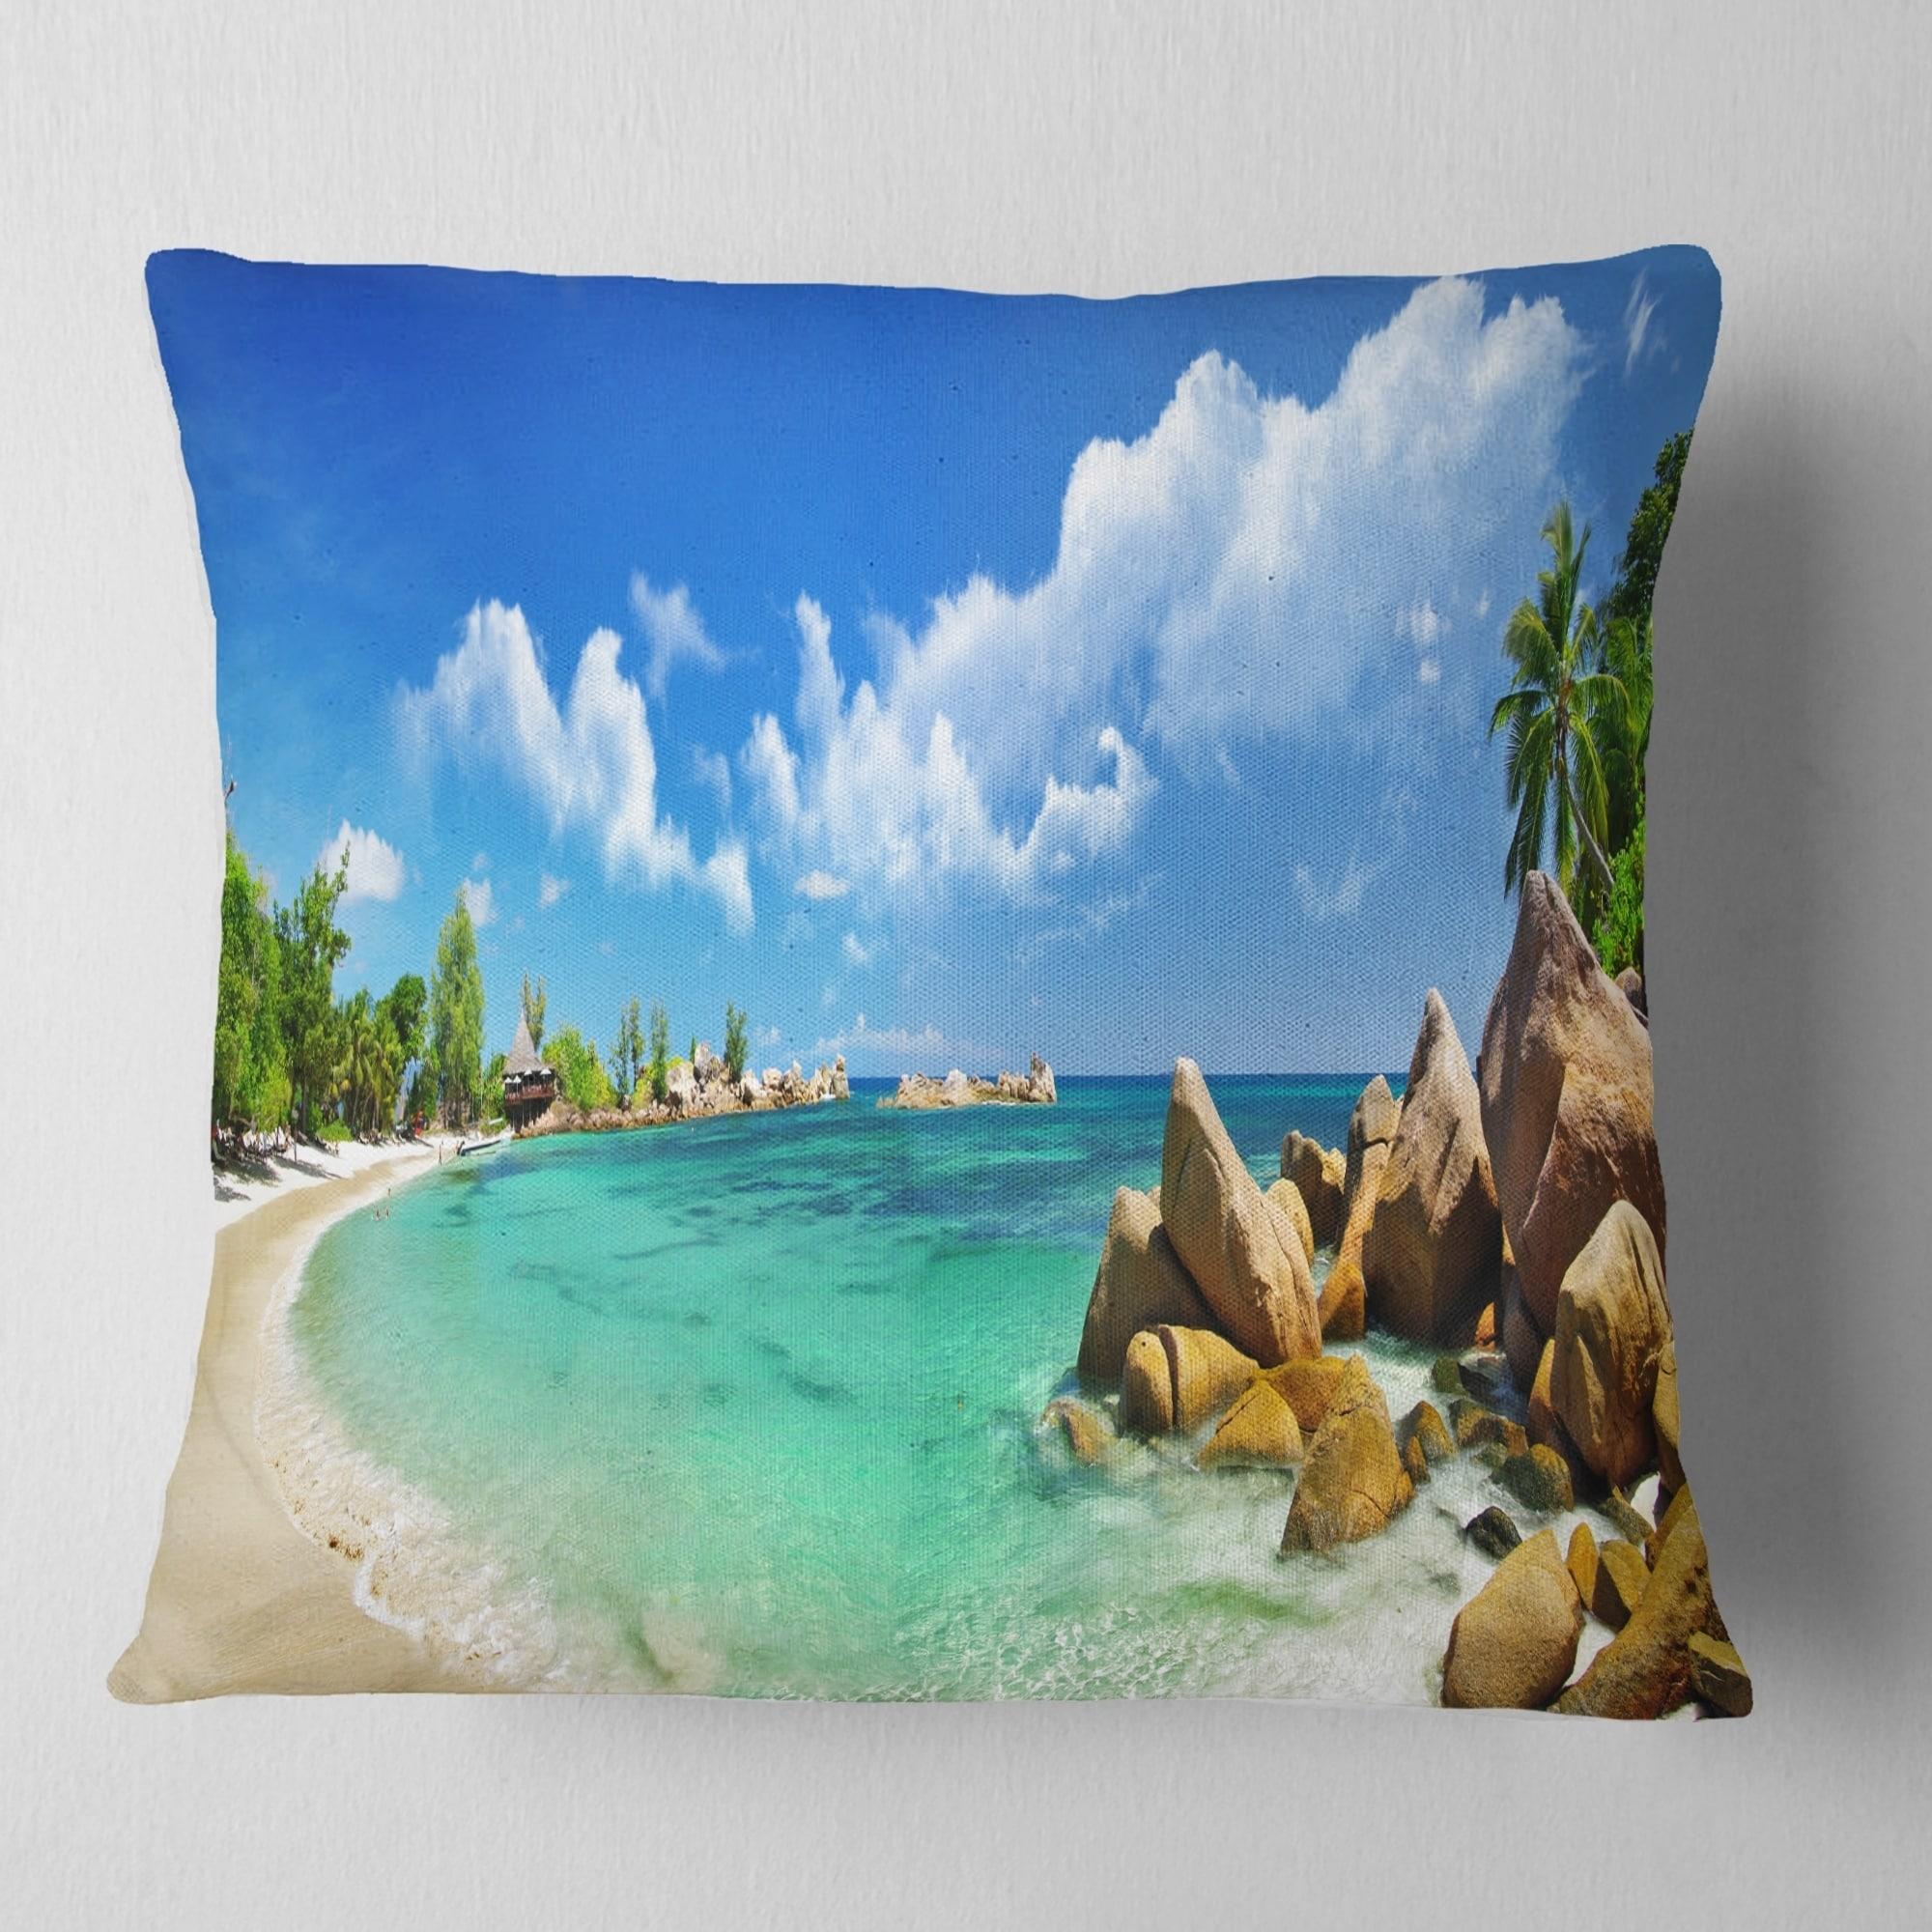 Designart Seychelles Islands Panorama Landscape Photography Throw Pillow On Sale Overstock 20945991